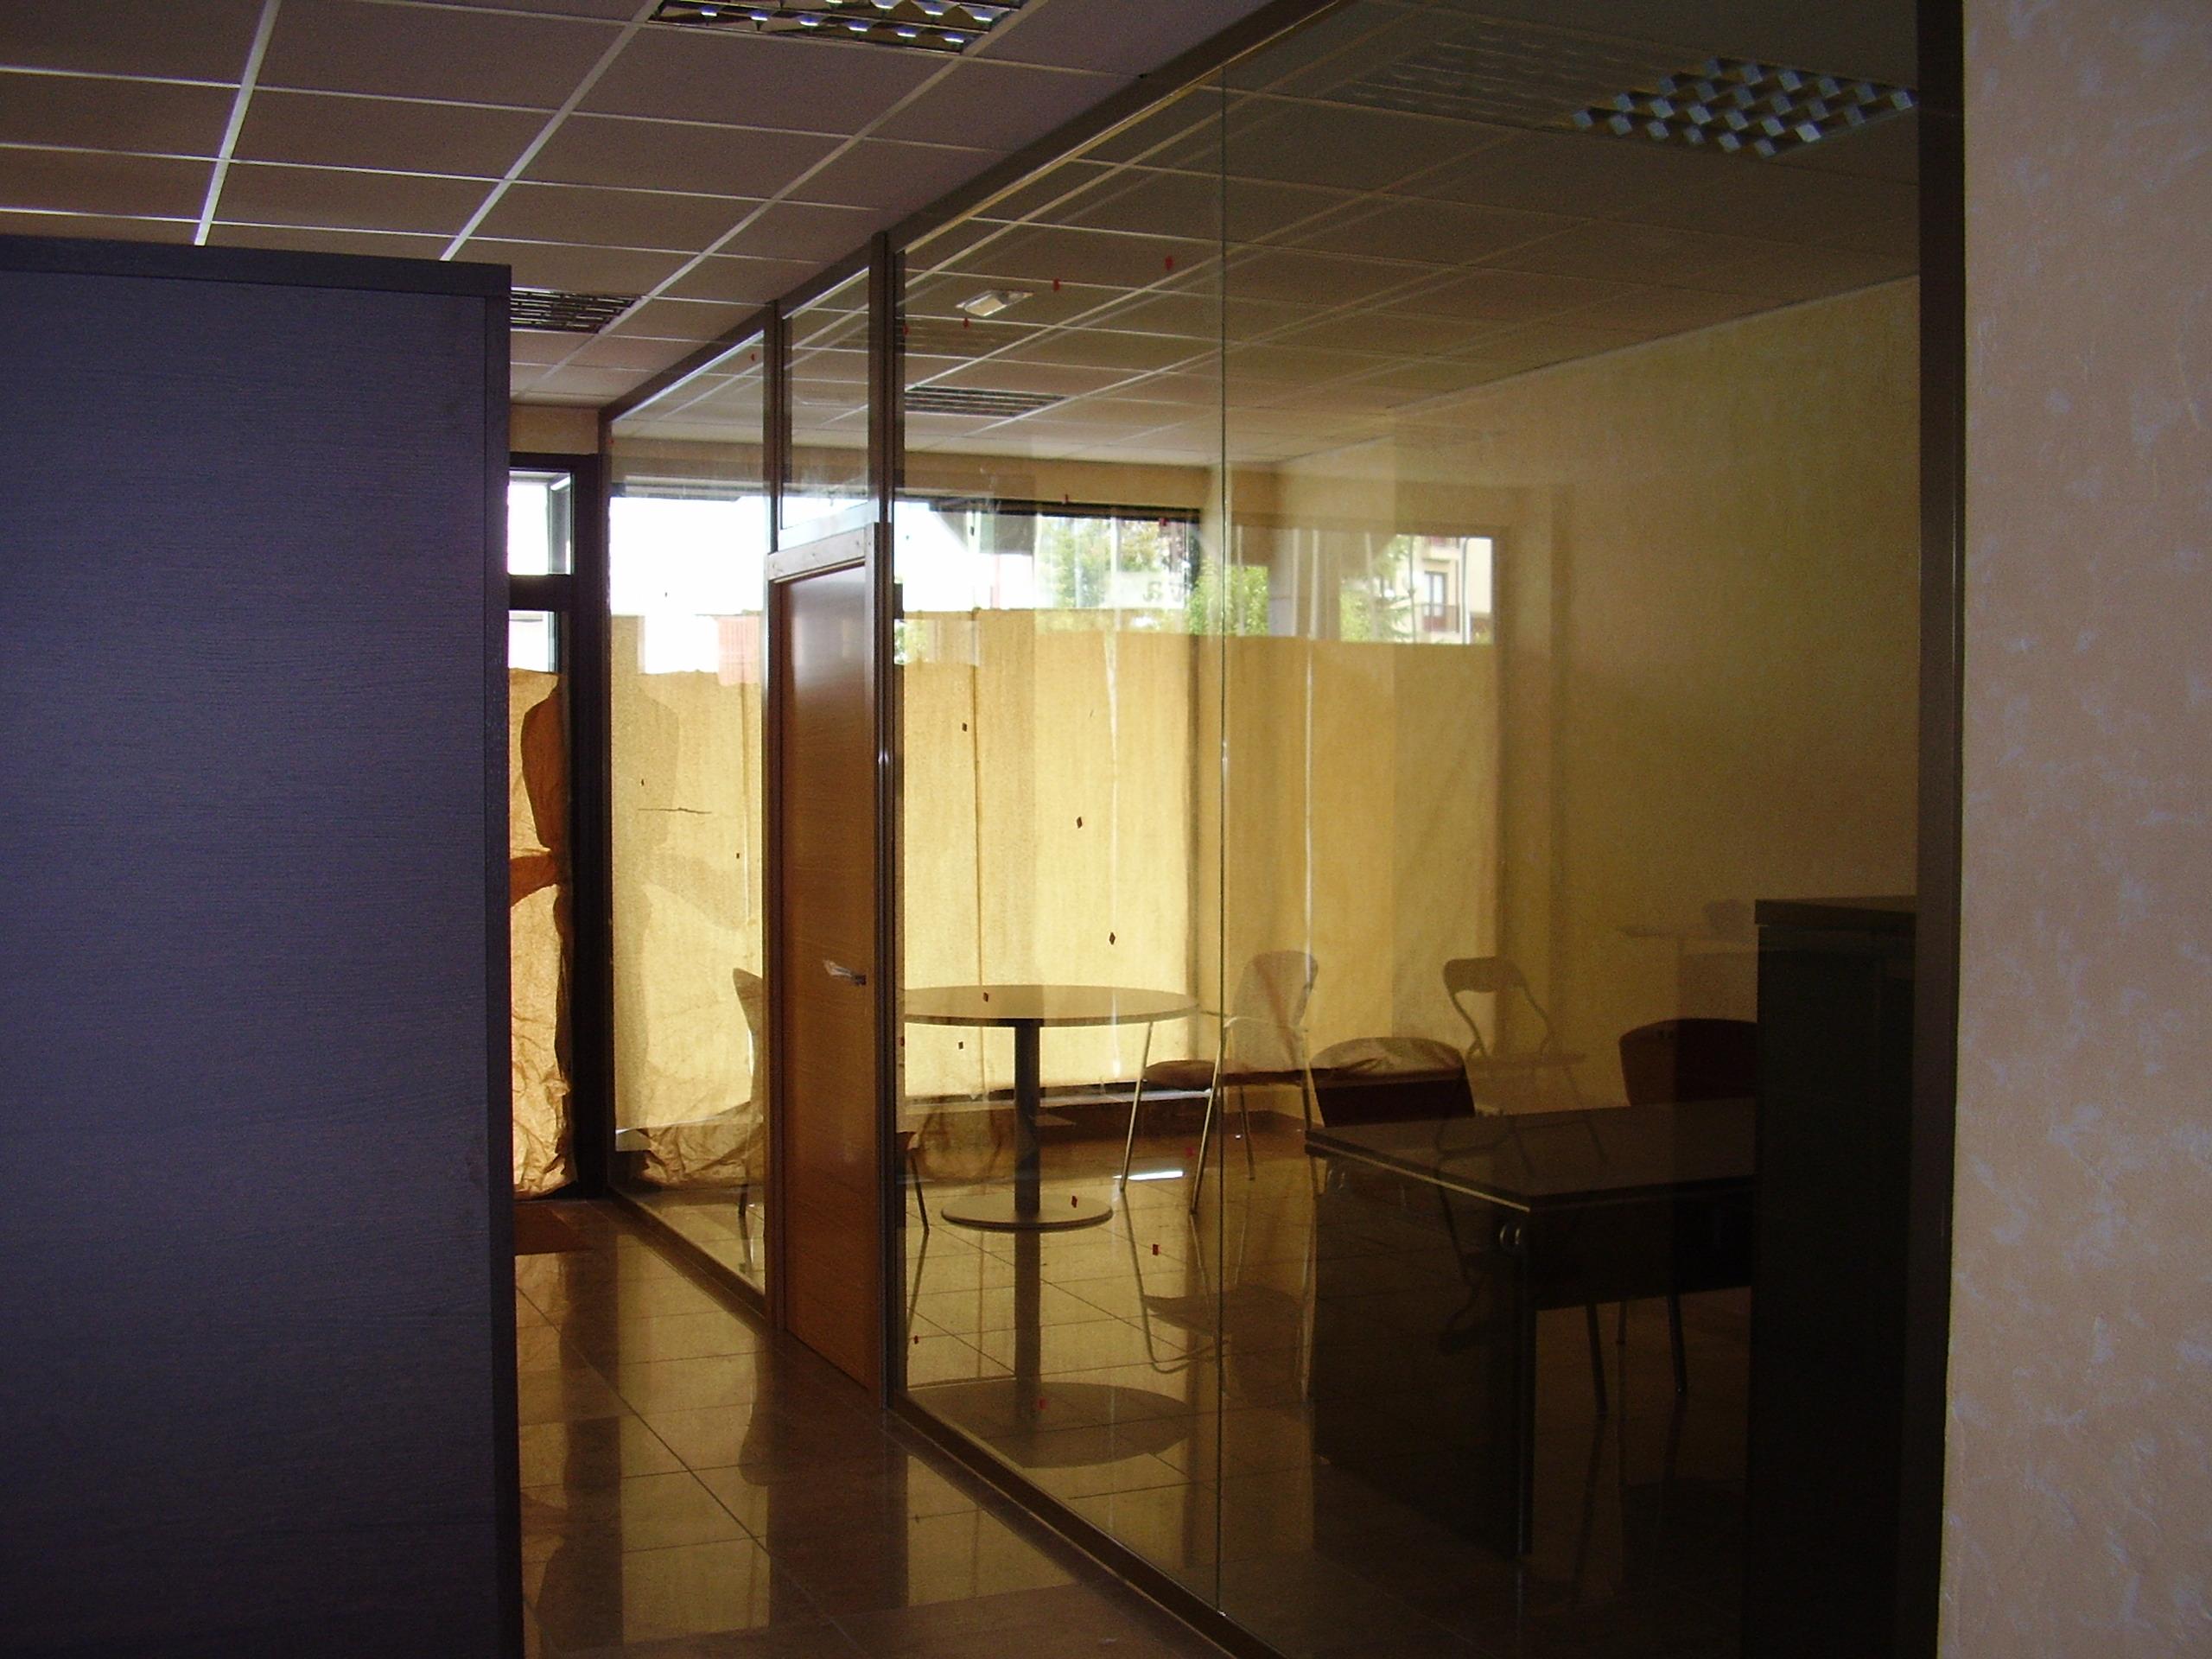 Mampara oficina toda cristal con puerta de madera